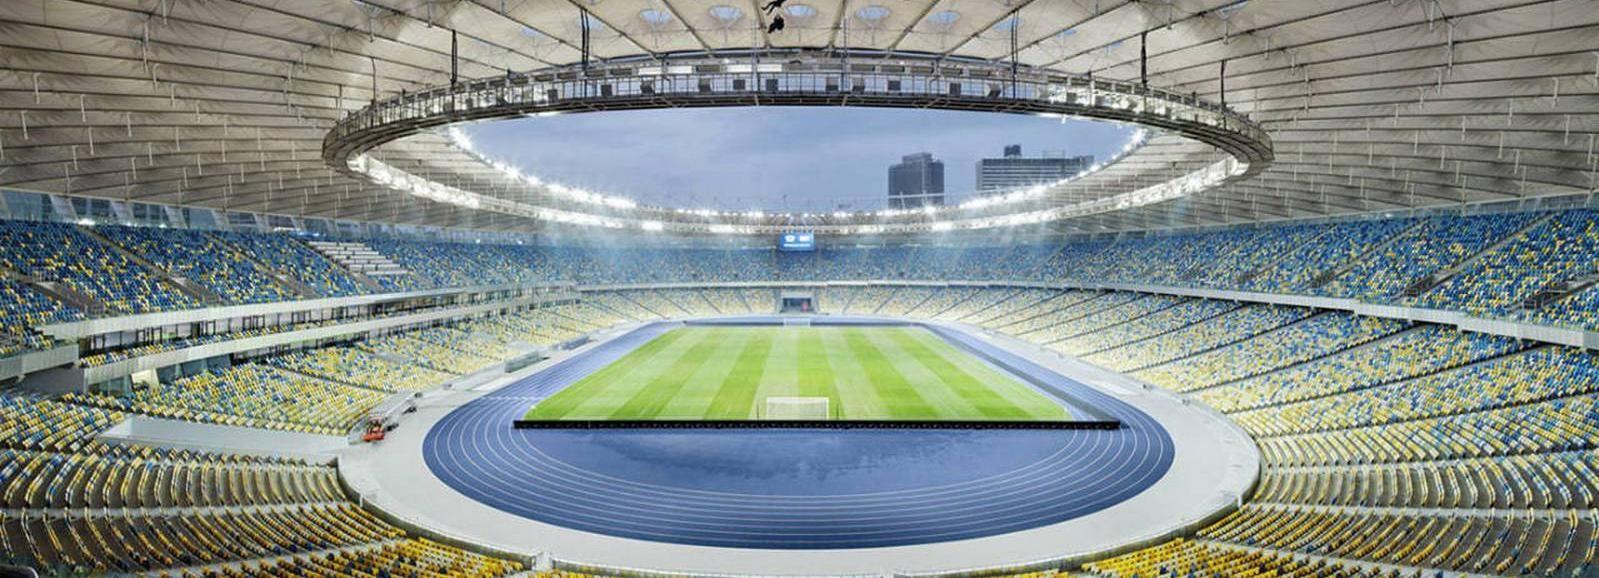 Kiew: Geführte Tour durch das Olympiastadion